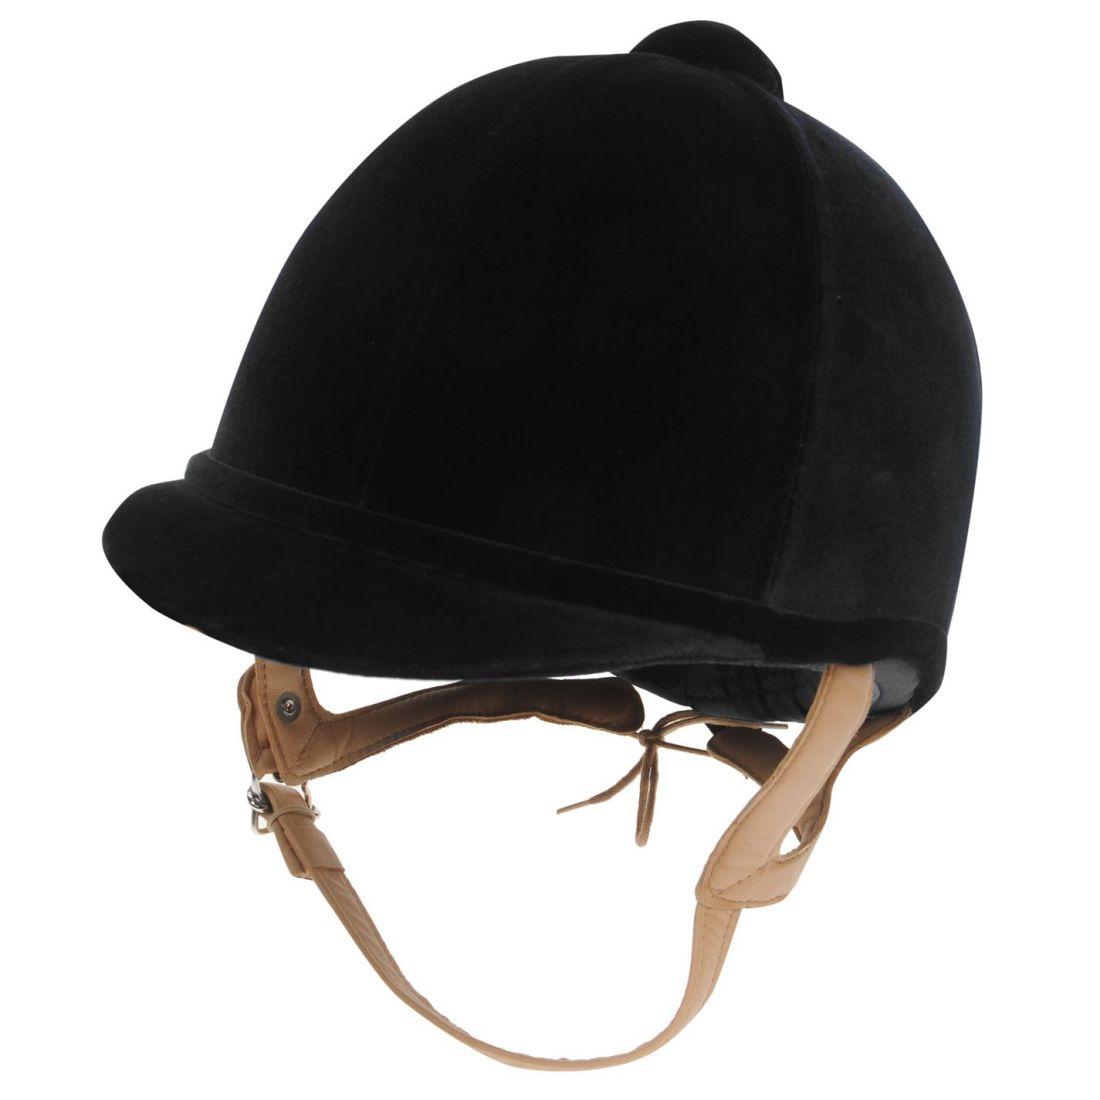 Charles Owen Ladies Ow Fian Riding Hat Headwear Accessory